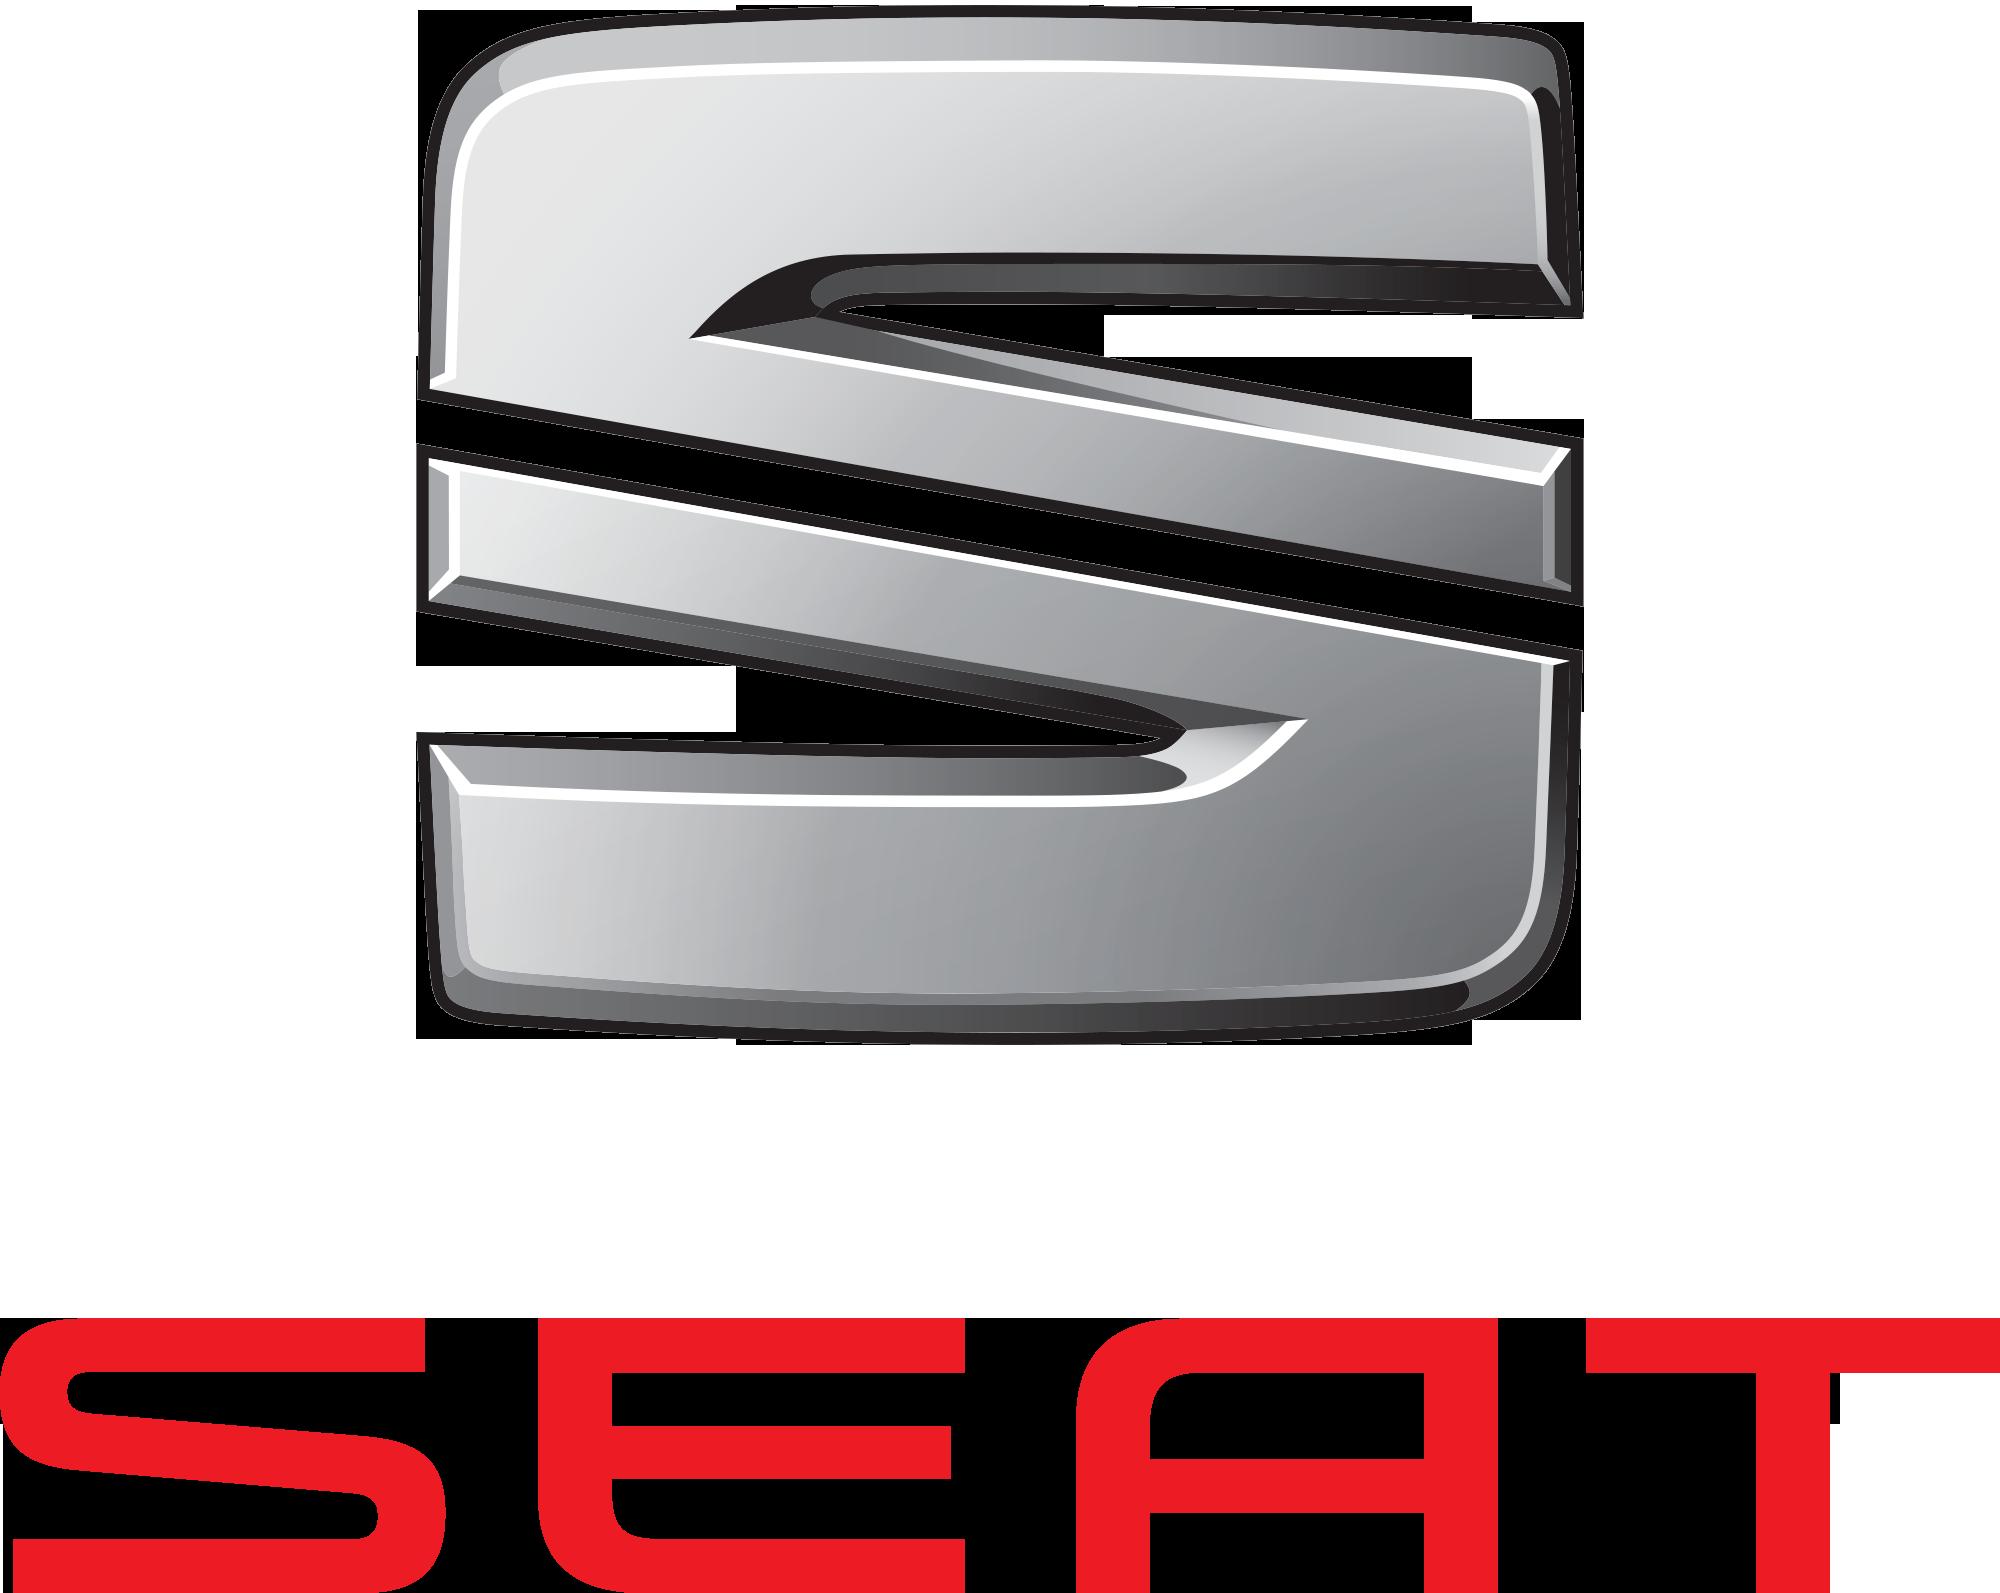 Basi sedile Seat